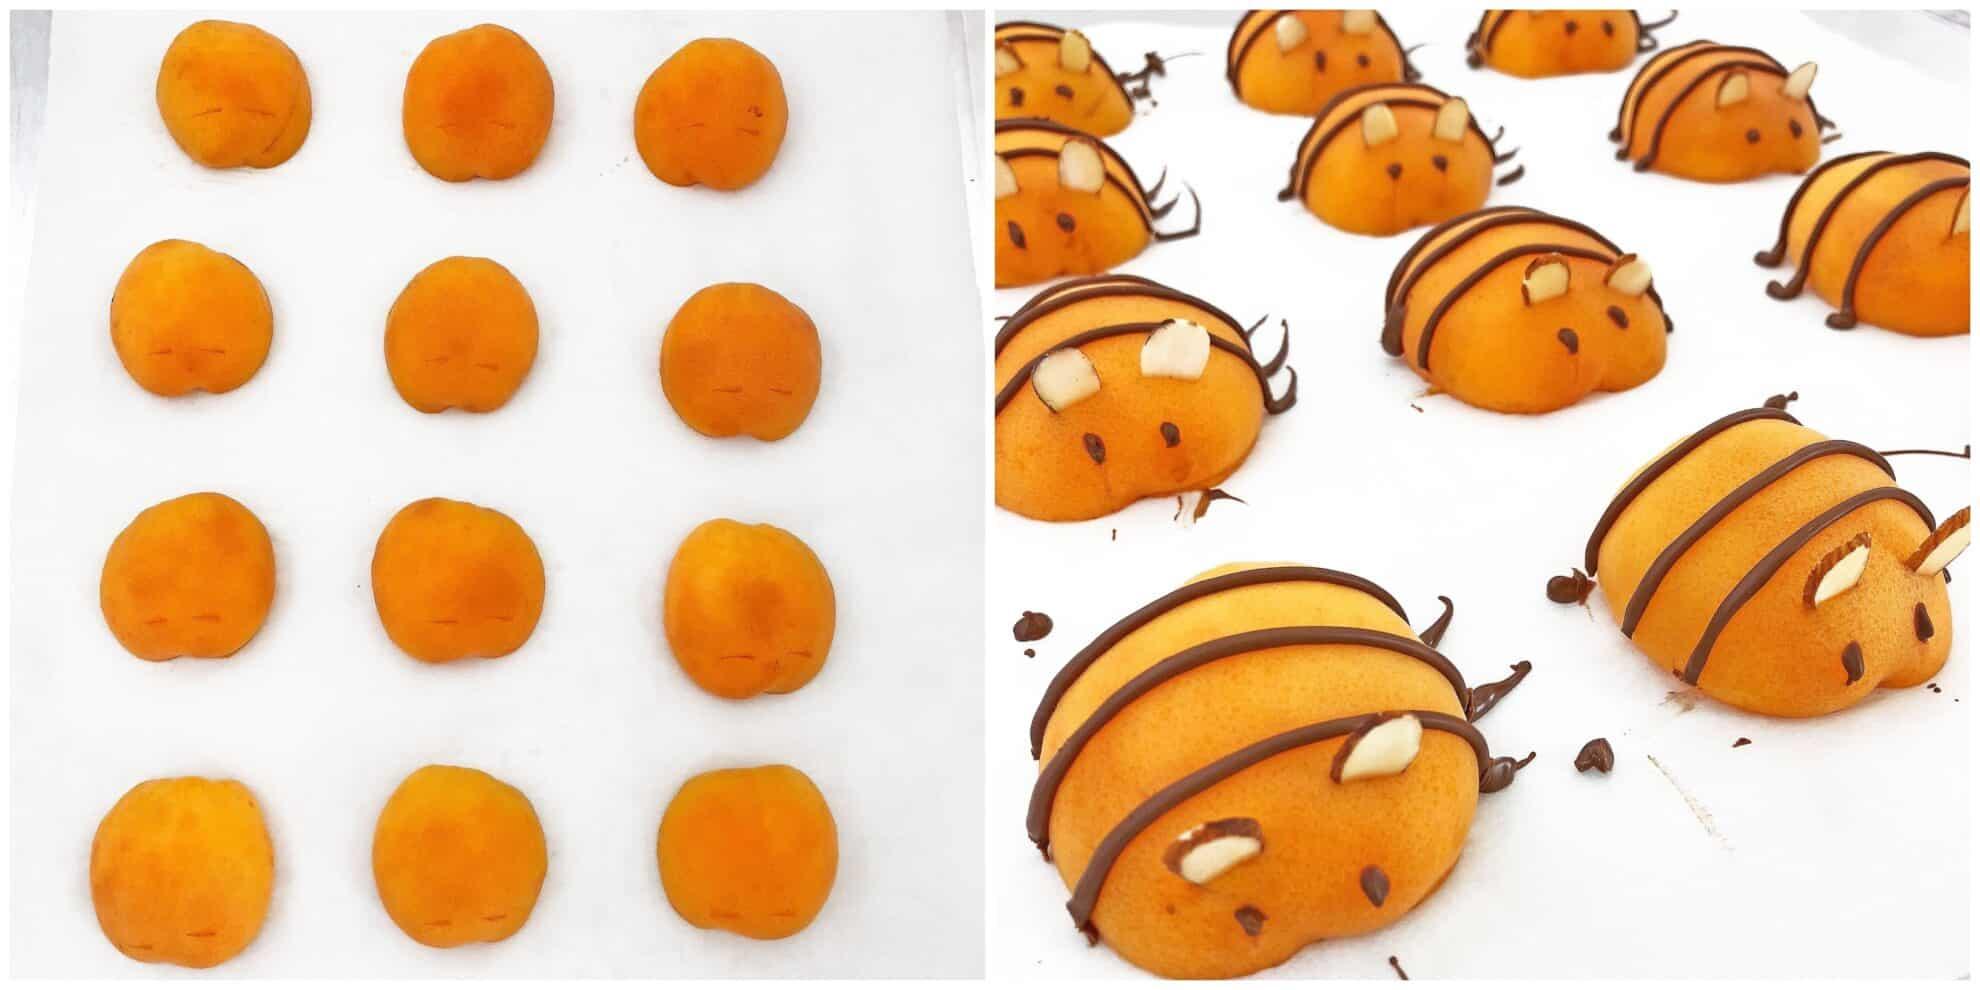 agar-agar, Apricot Bee Cake Recipe, apricot bees, apricot cake, cake, cake recipe, dessert, easy recipe, fresh apricot, kid-friendly dessert, kids love it, sheet cake, summer dessert